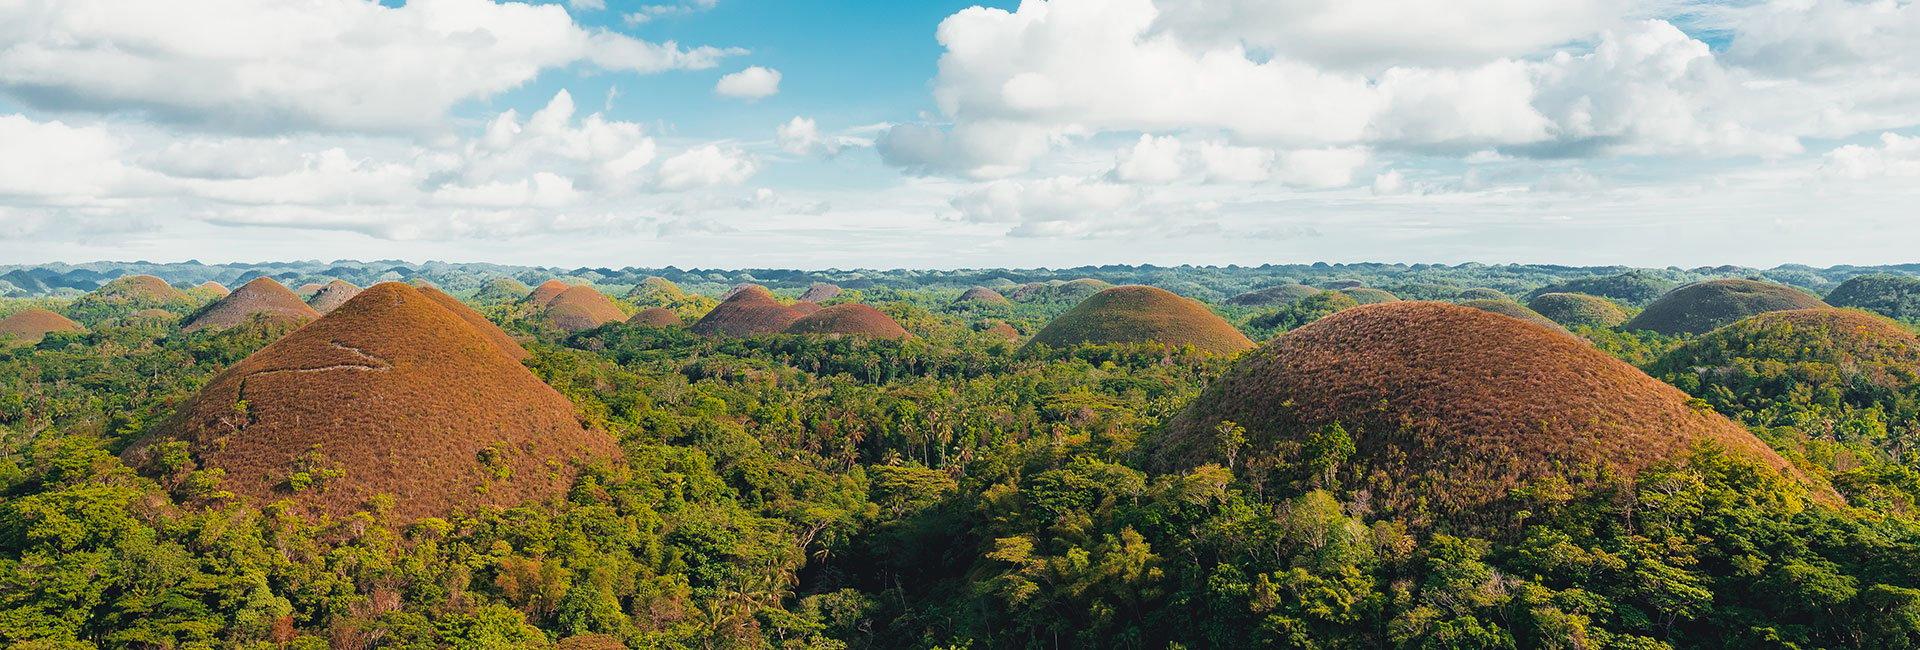 12_Bohol_Island